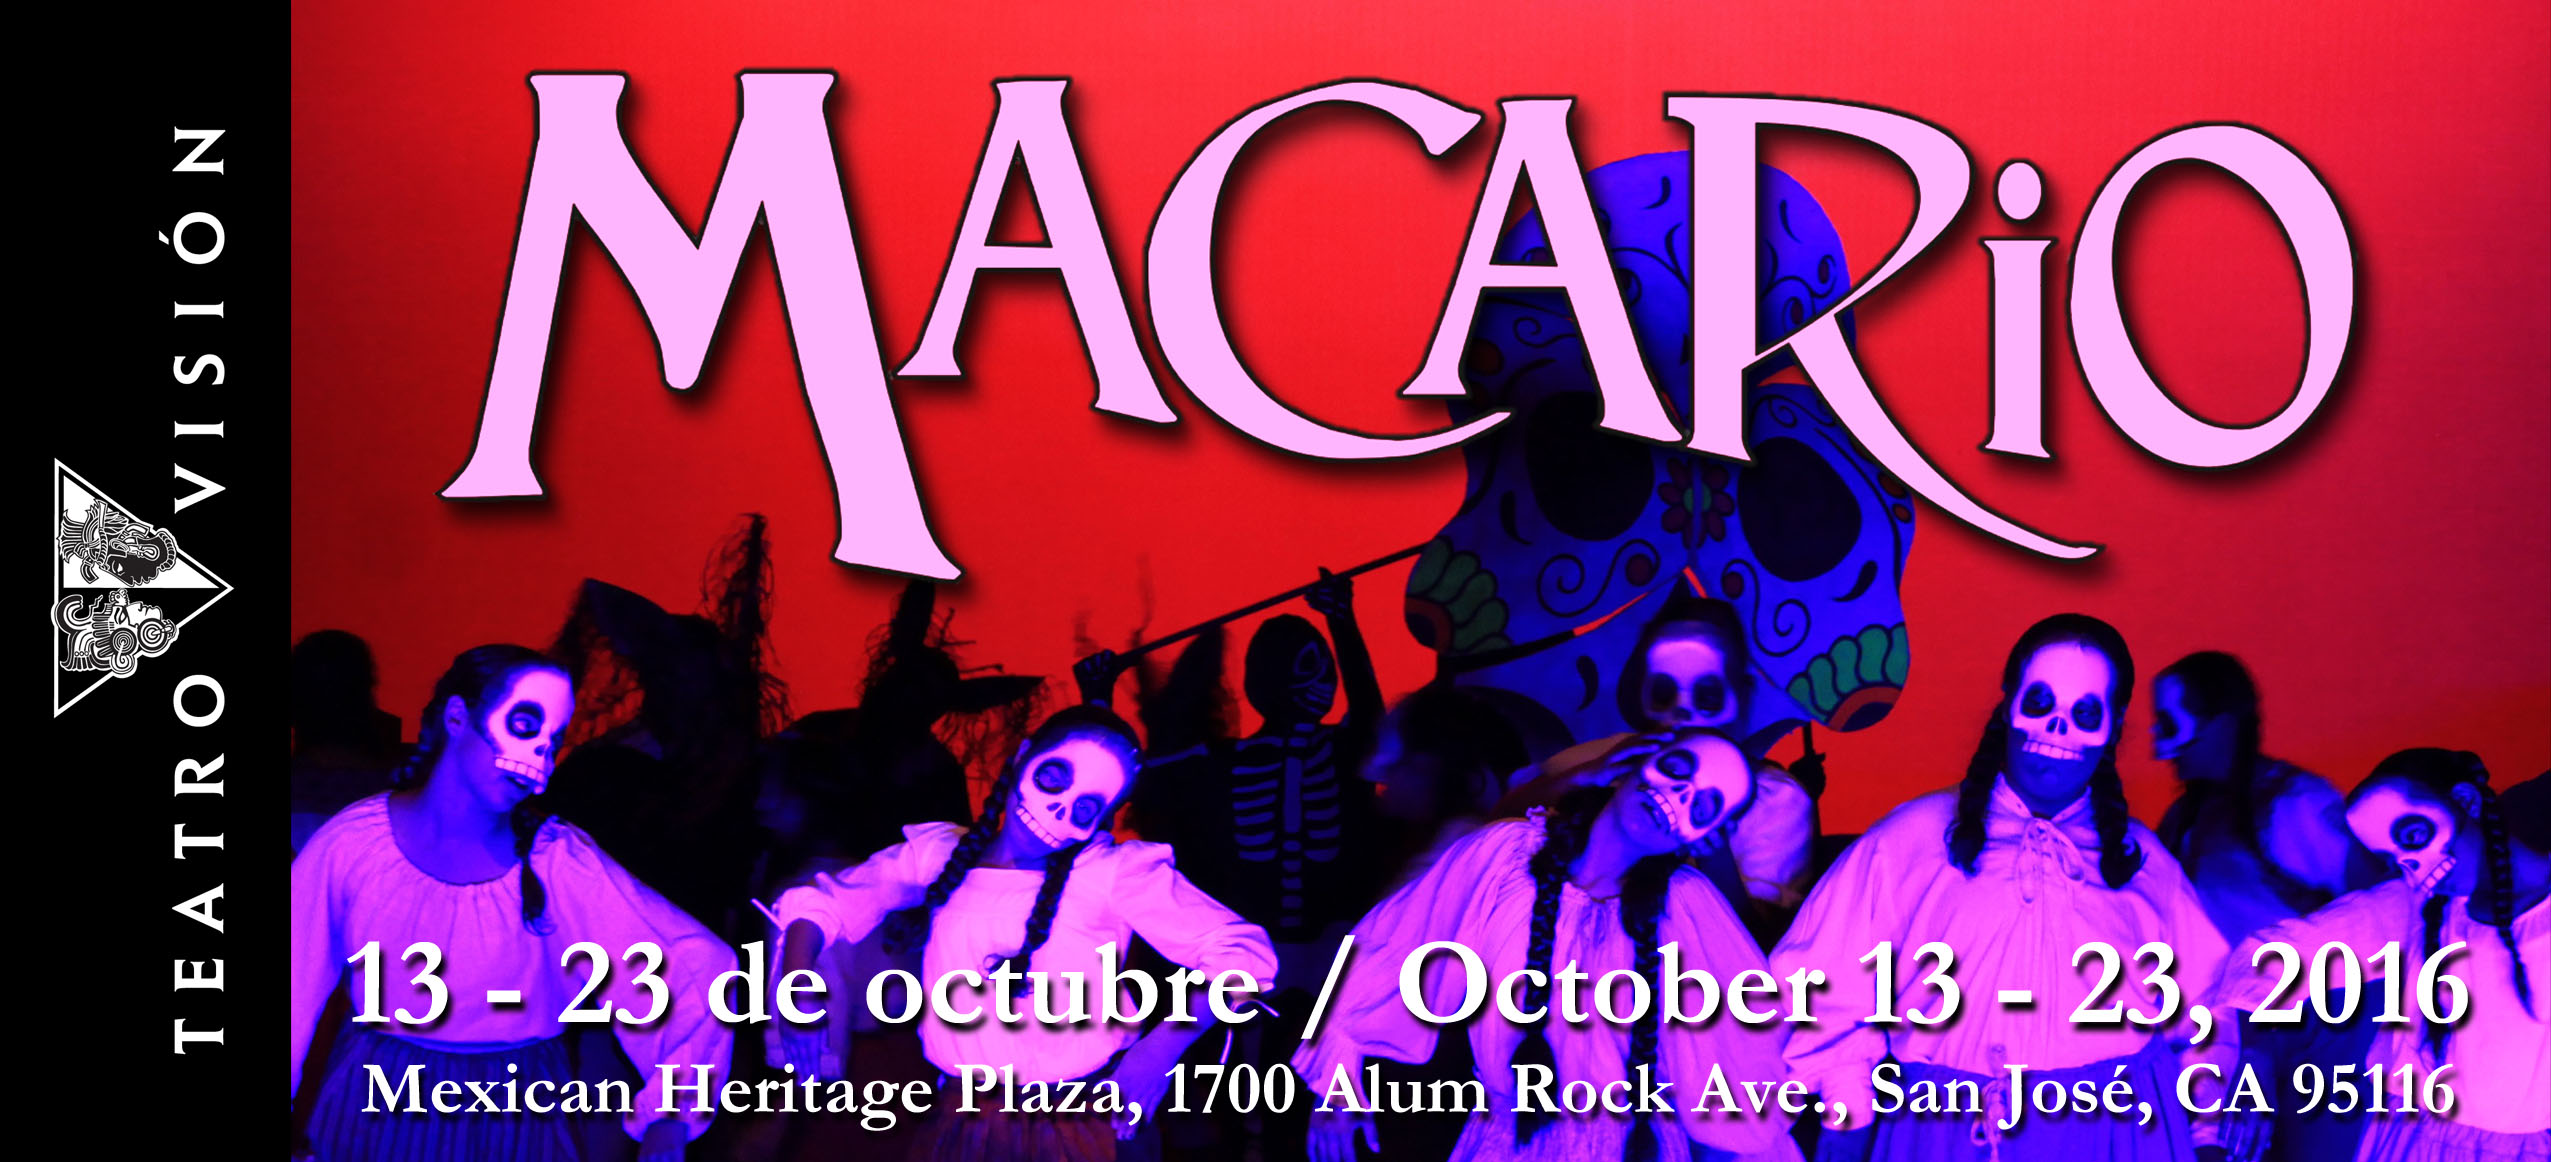 Macario_website_banner_2.jpg